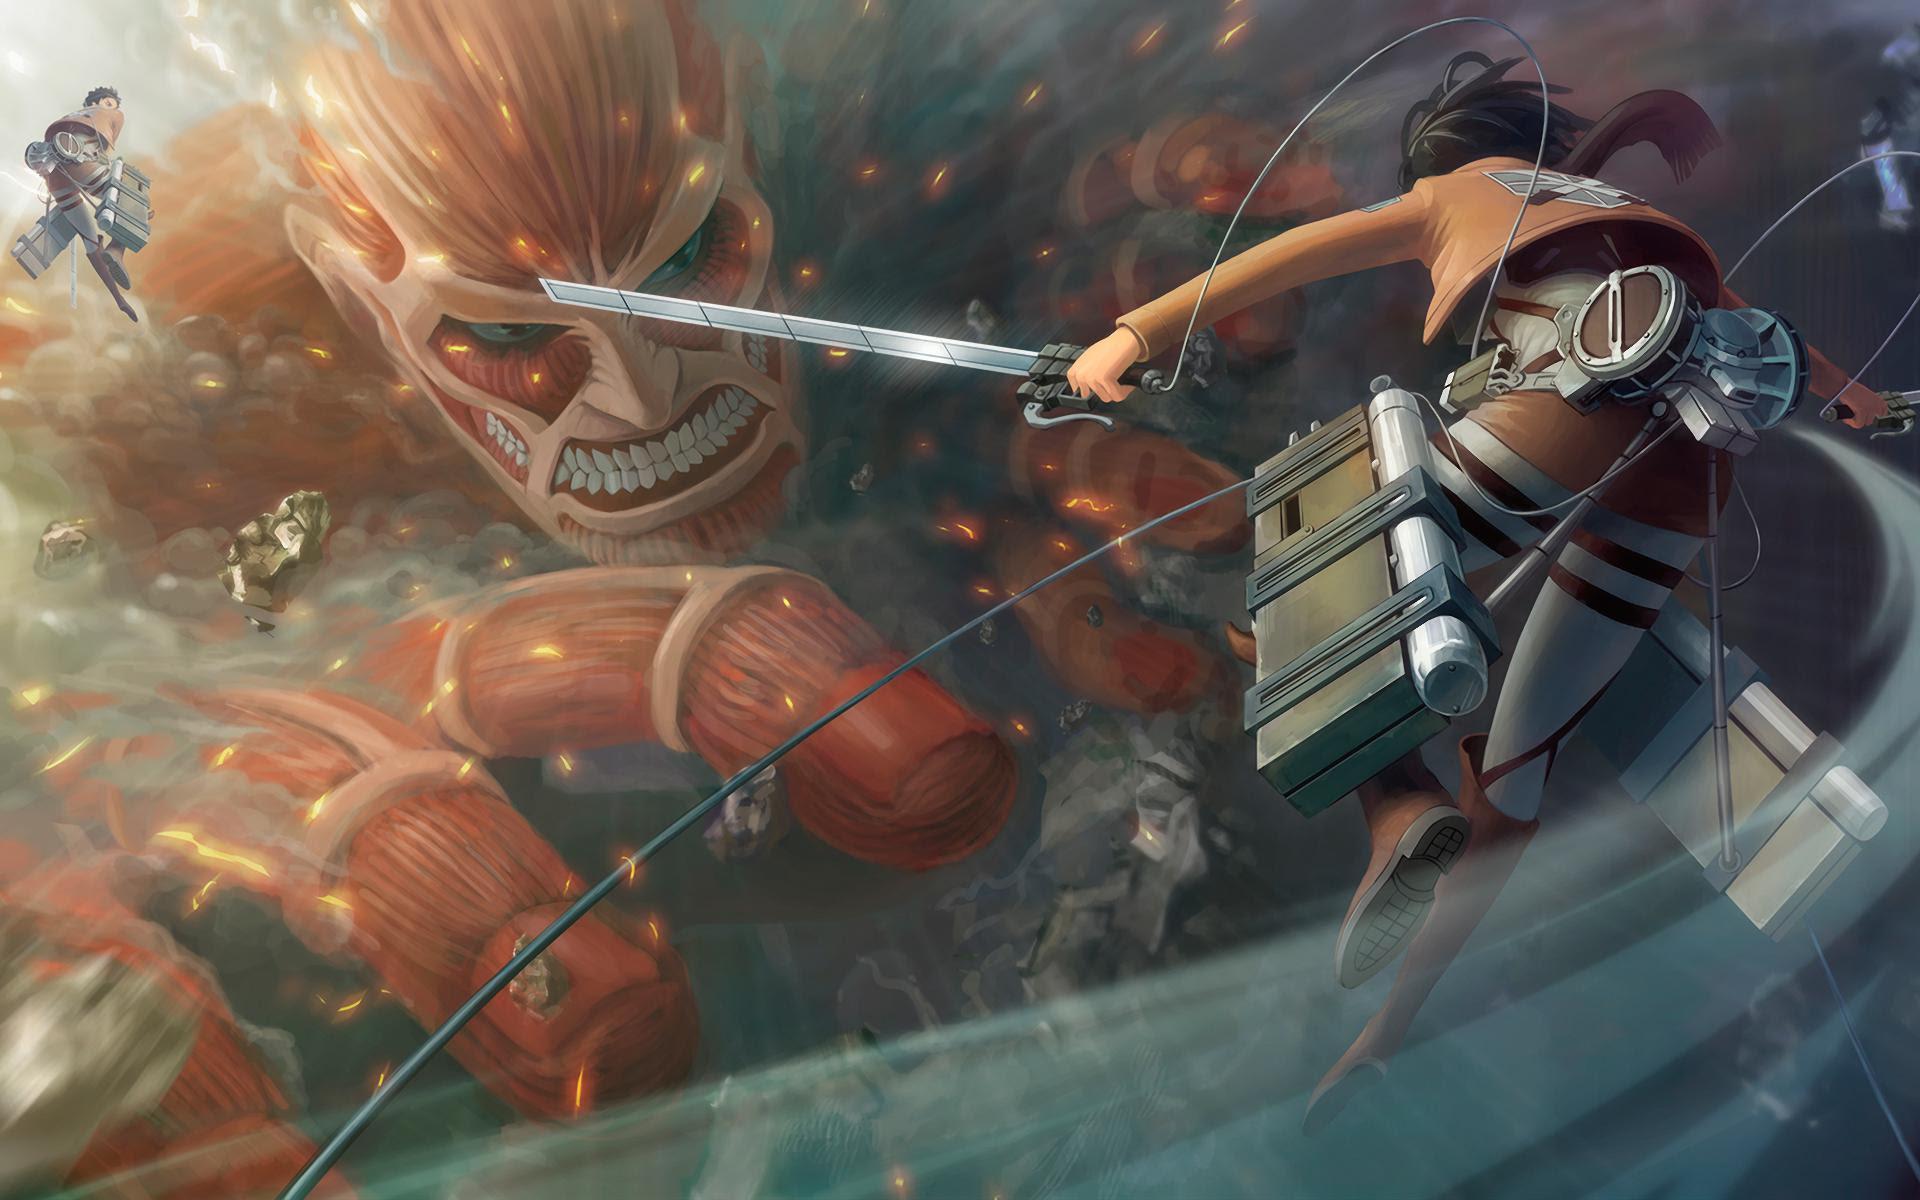 Download 54 Wallpaper Hd Mikasa HD Terbaru